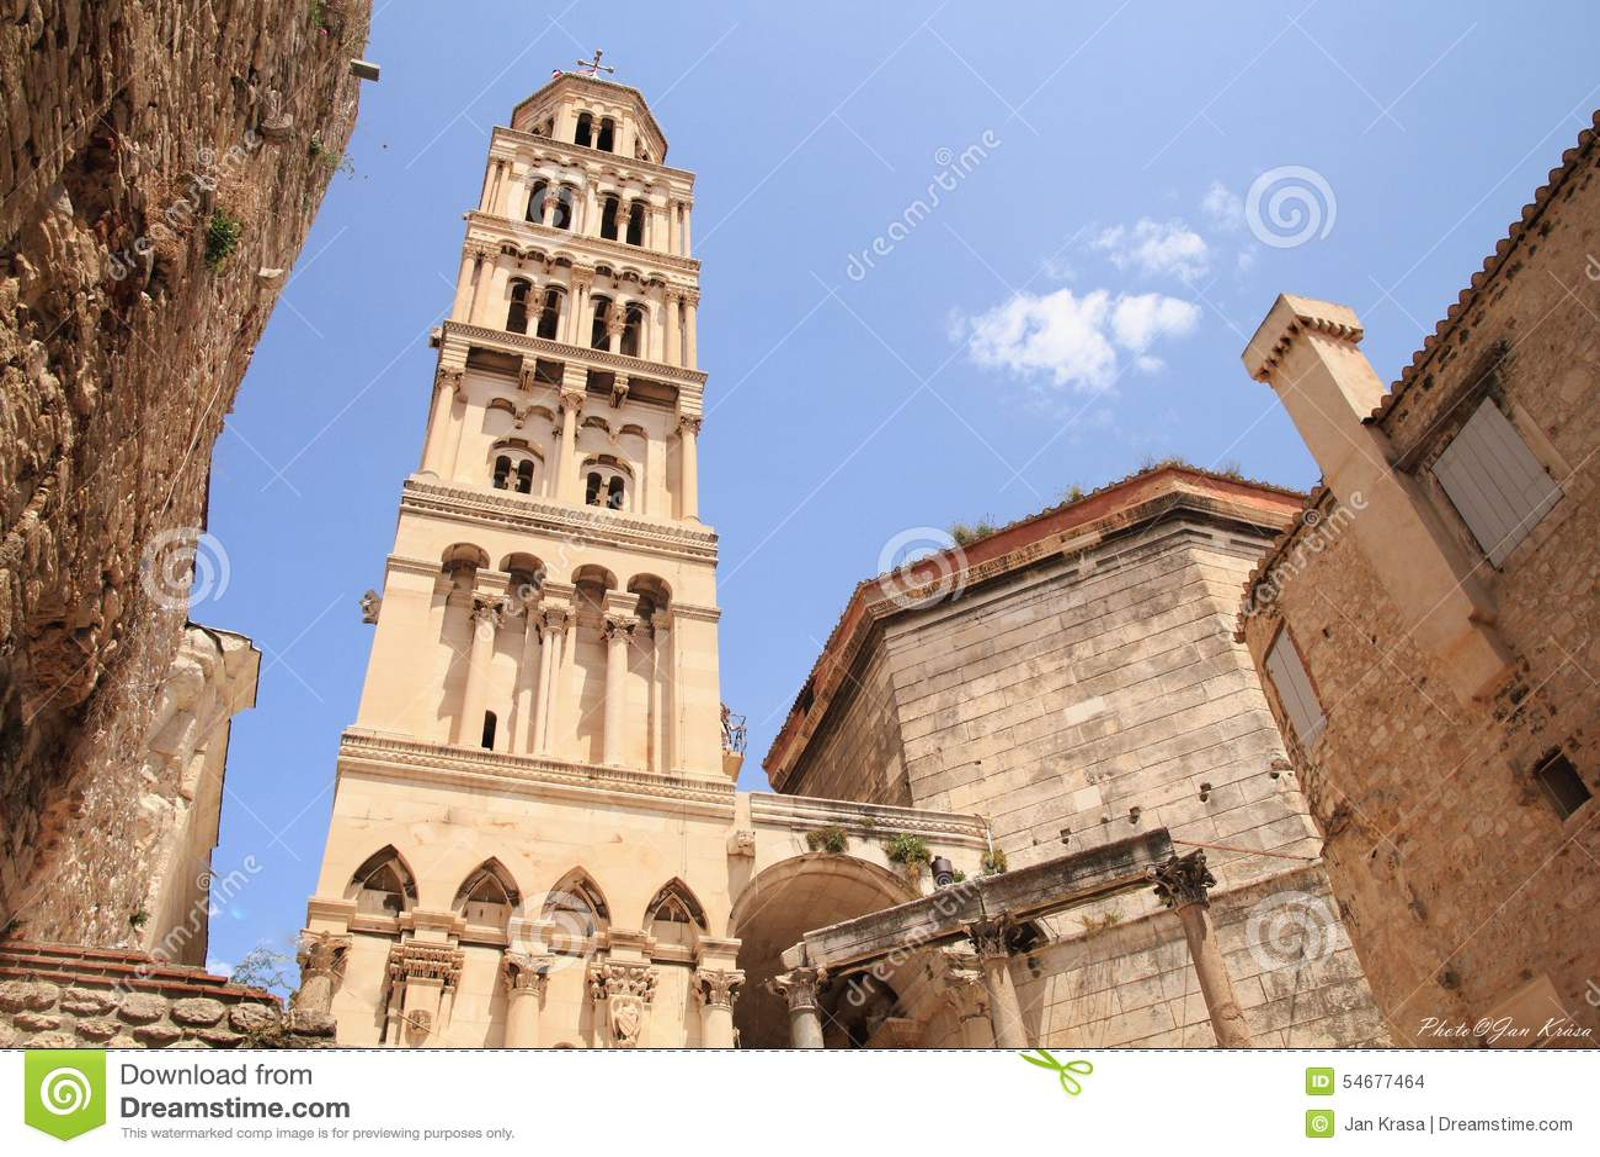 Spalte - Detail - Turm